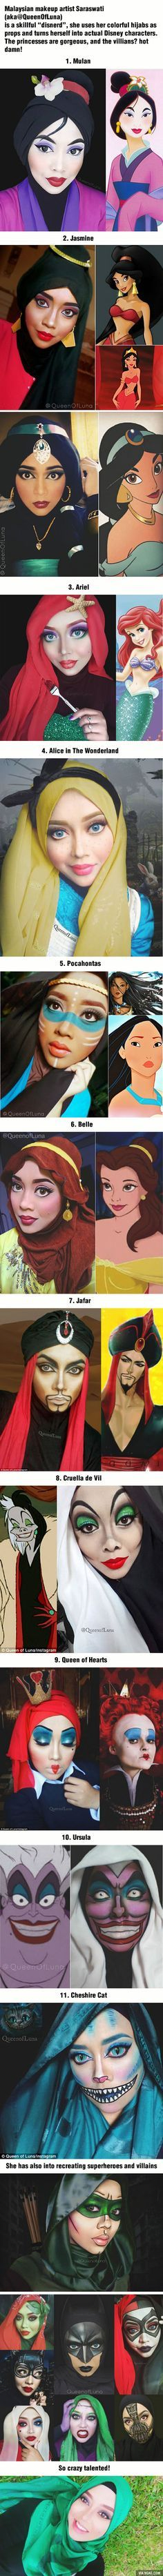 Malaysian Makeup Artist Saraswati (@QueenofLuna) transforms into stunning Disney characters using her hijab ~ her idea is amazing! And she looks stunning indeed